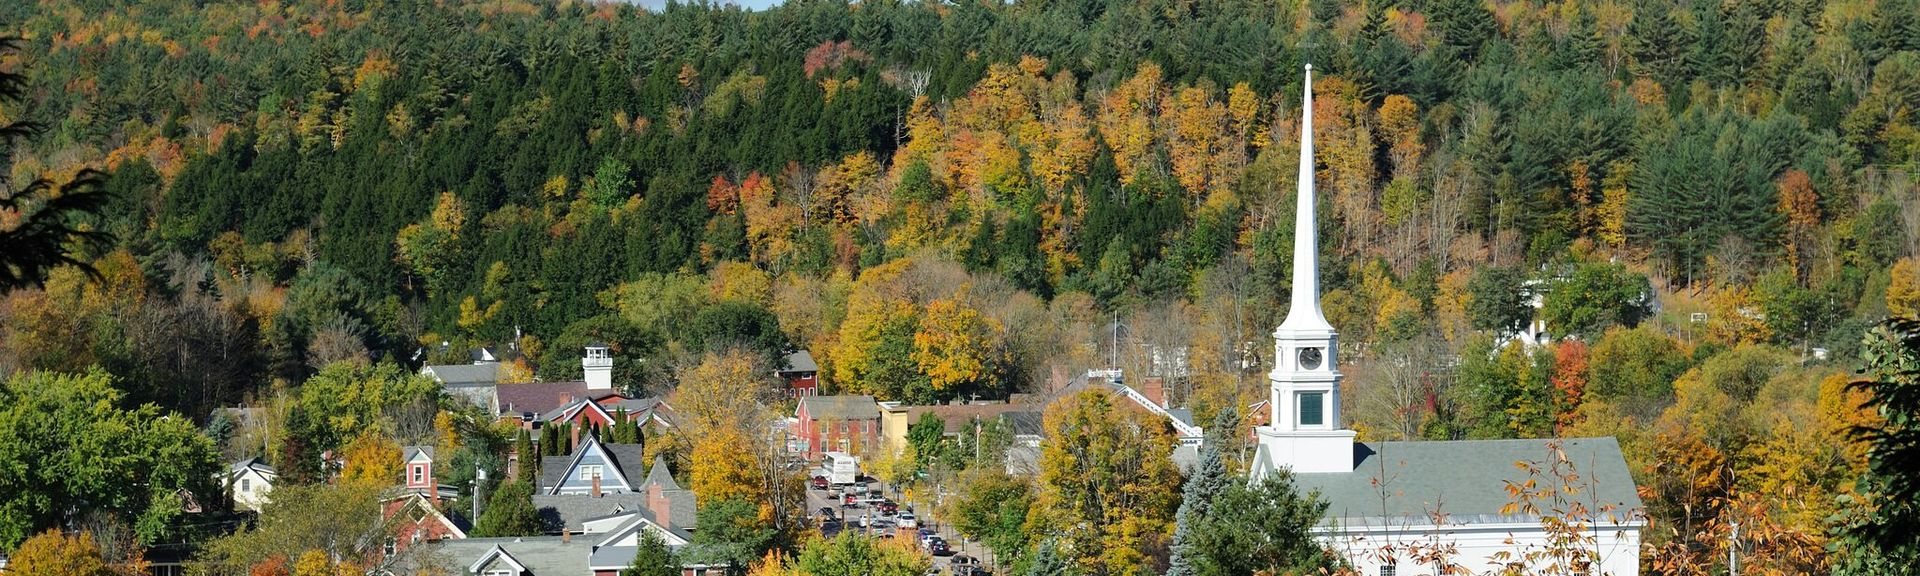 Stowe, Vermont, Estados Unidos